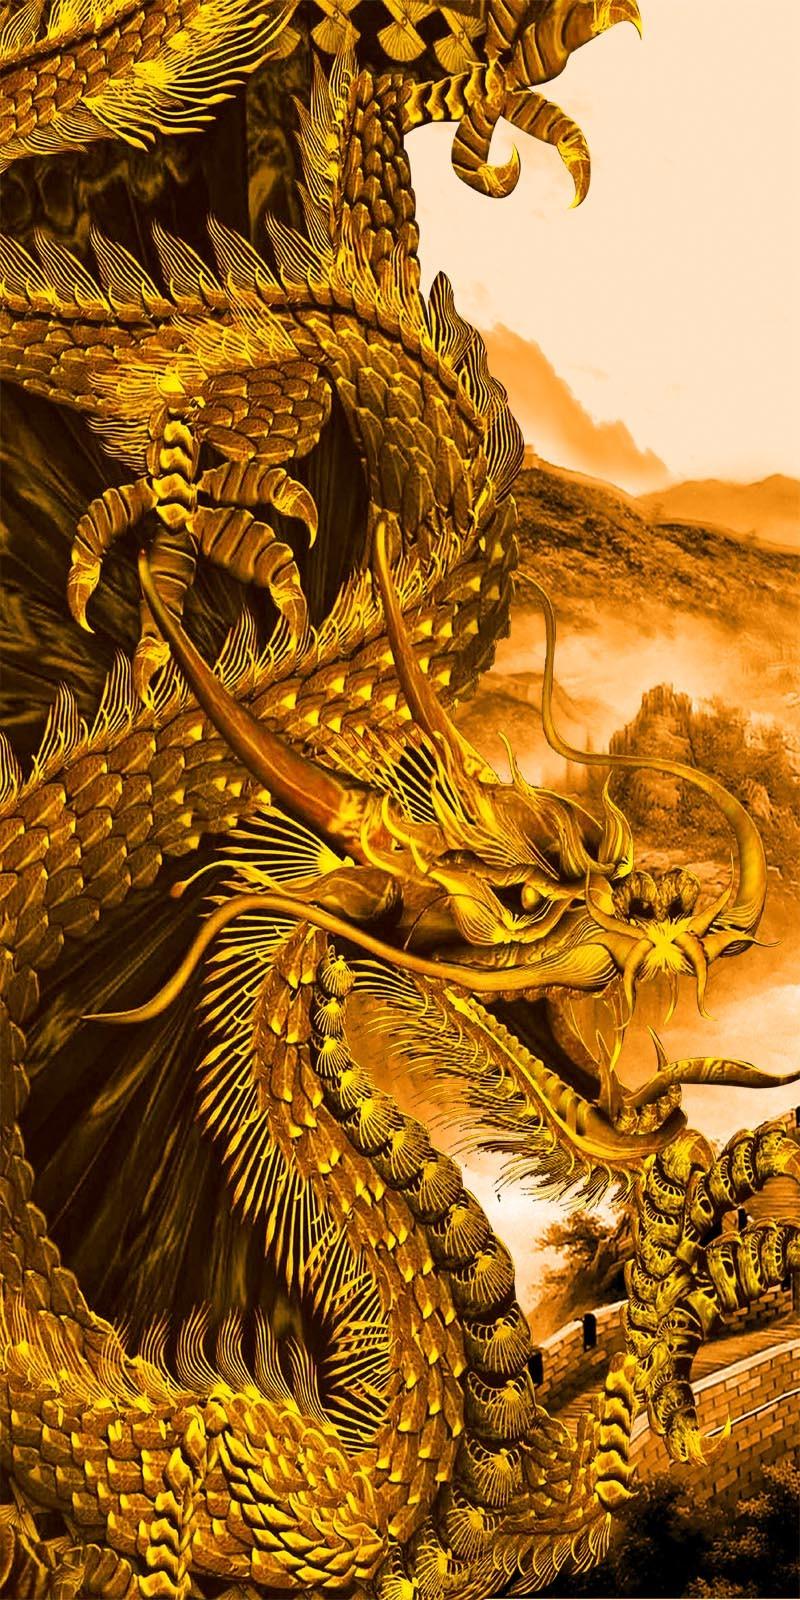 US $17 54 OFF Golden Dragon Wallpaper Custom Photo Wallpaper 3D Of Wall Paper Bedroom Living Room TV Background Wall Covering Mural